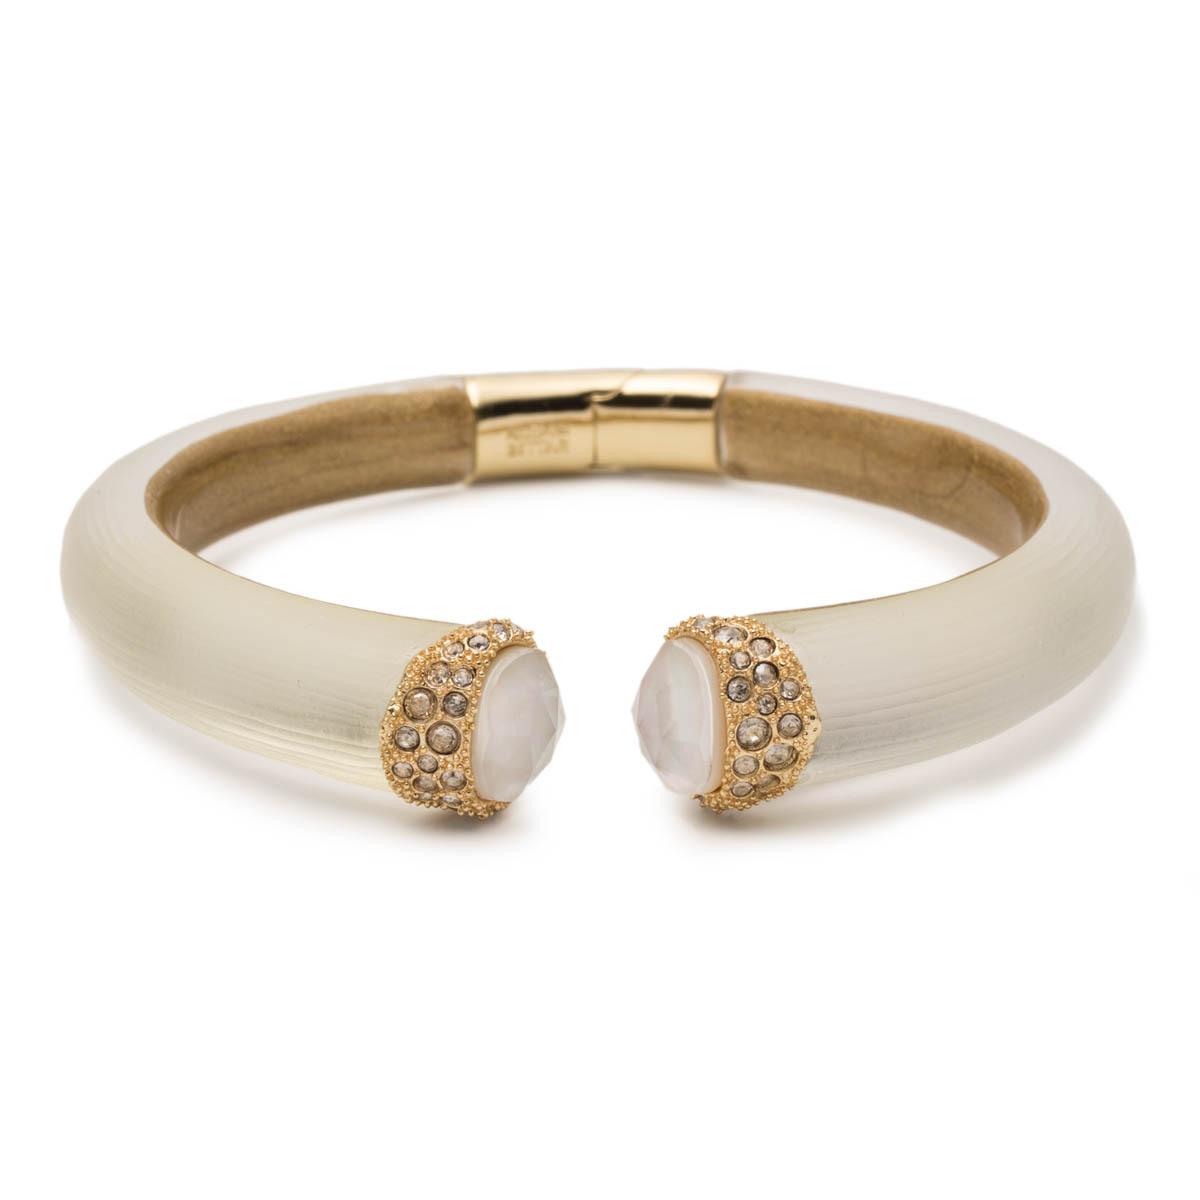 Alexis Bittar Crystal Encrusted Capped Hinge Bracelet csTCvnyS